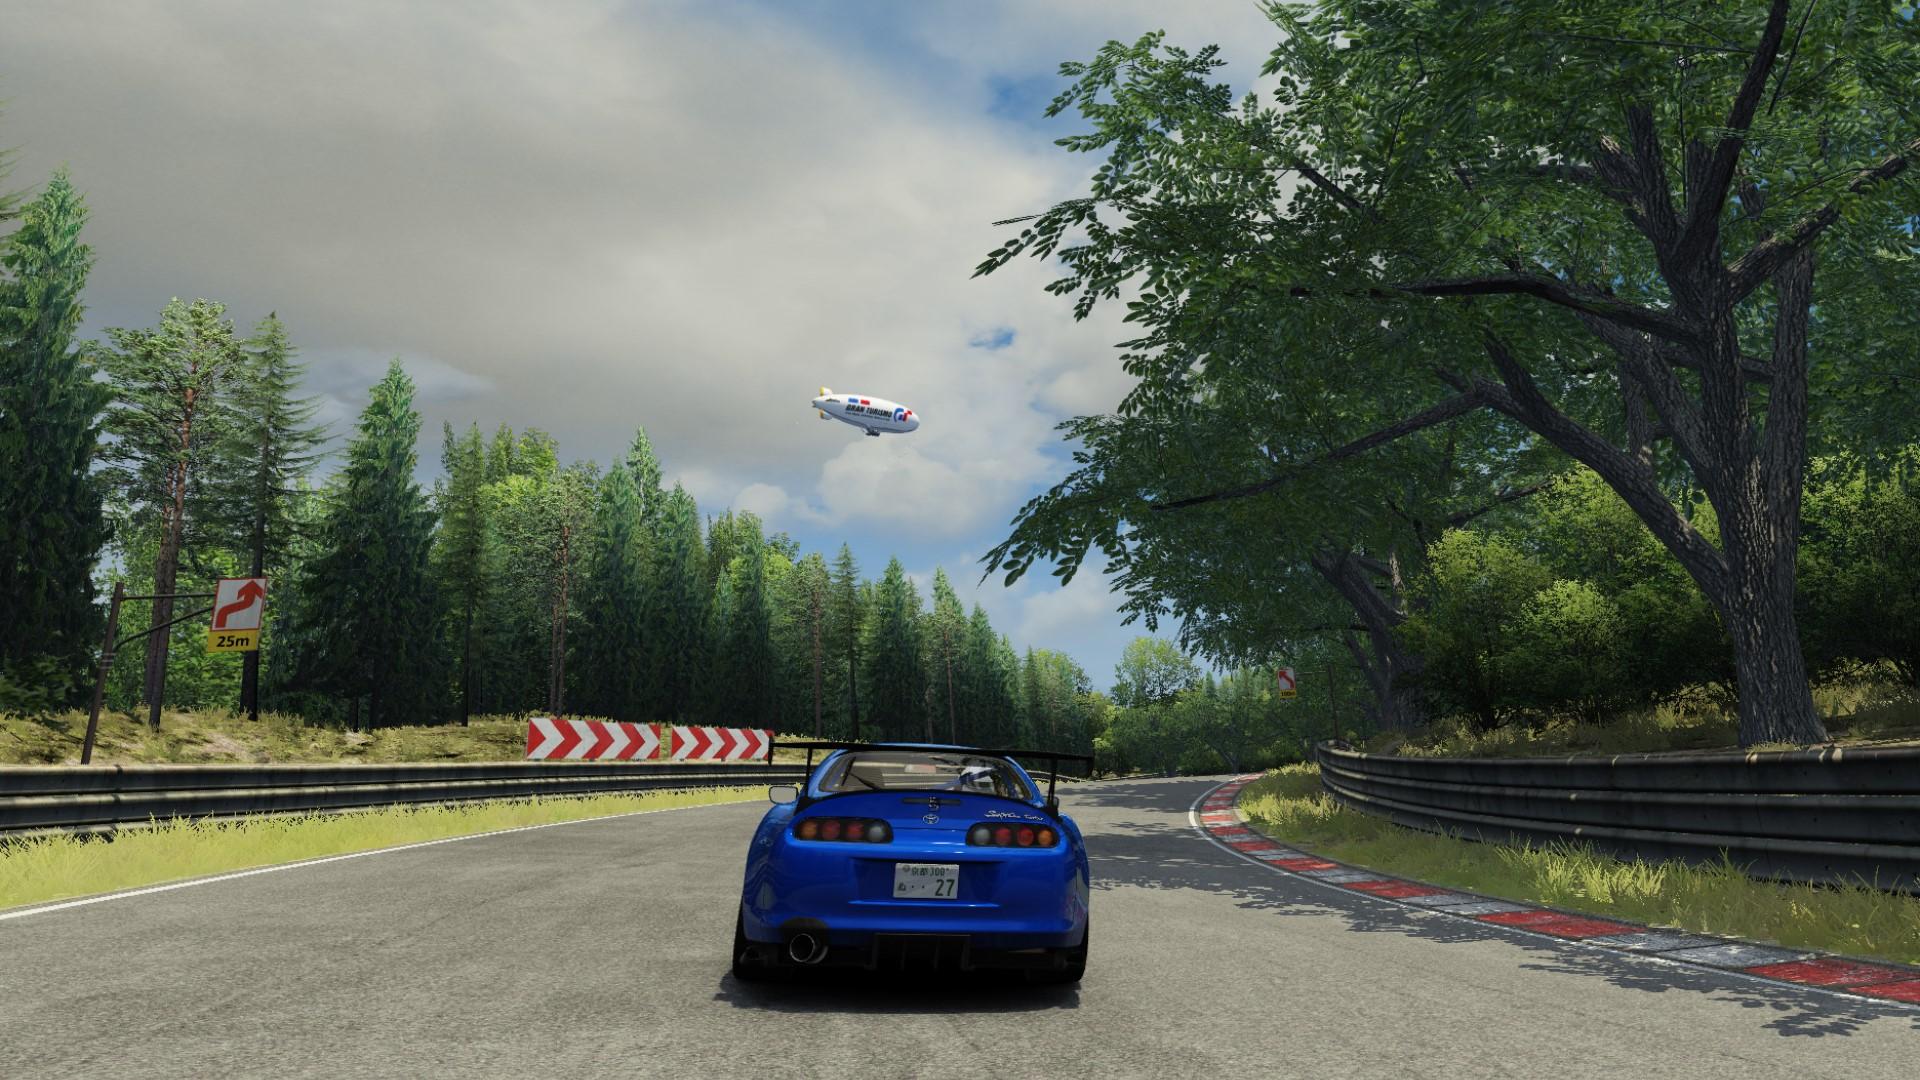 Screenshot_sl_toyota_supra_mkiv_ridox_deepforest_raceway_9-5-120-21-16-52.jpg